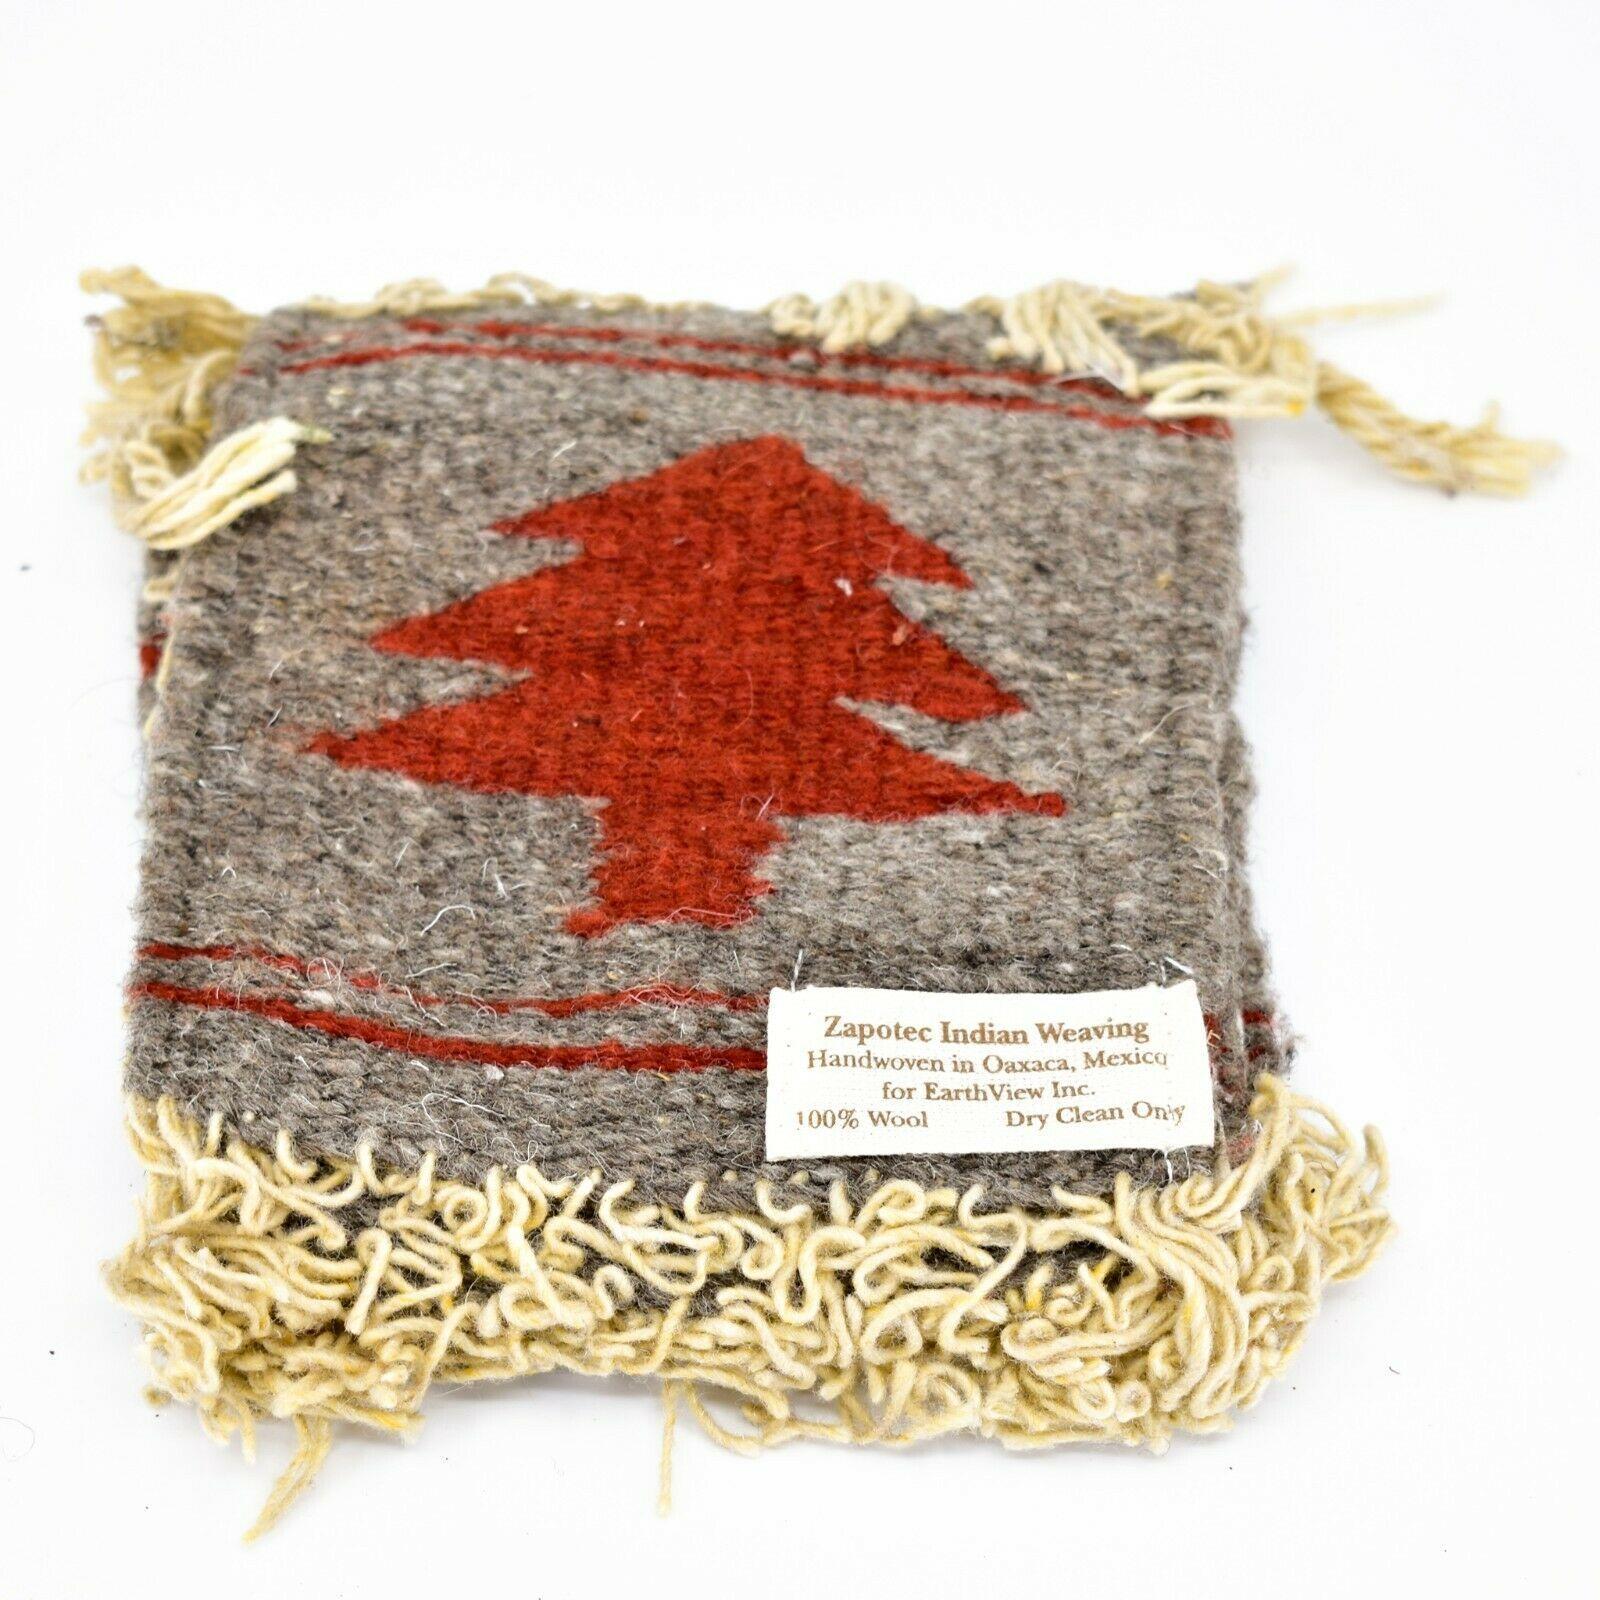 Handmade Zapotec Indian Weaving Hand-Woven Pine Tree Gray Wool Coaster Set of 4